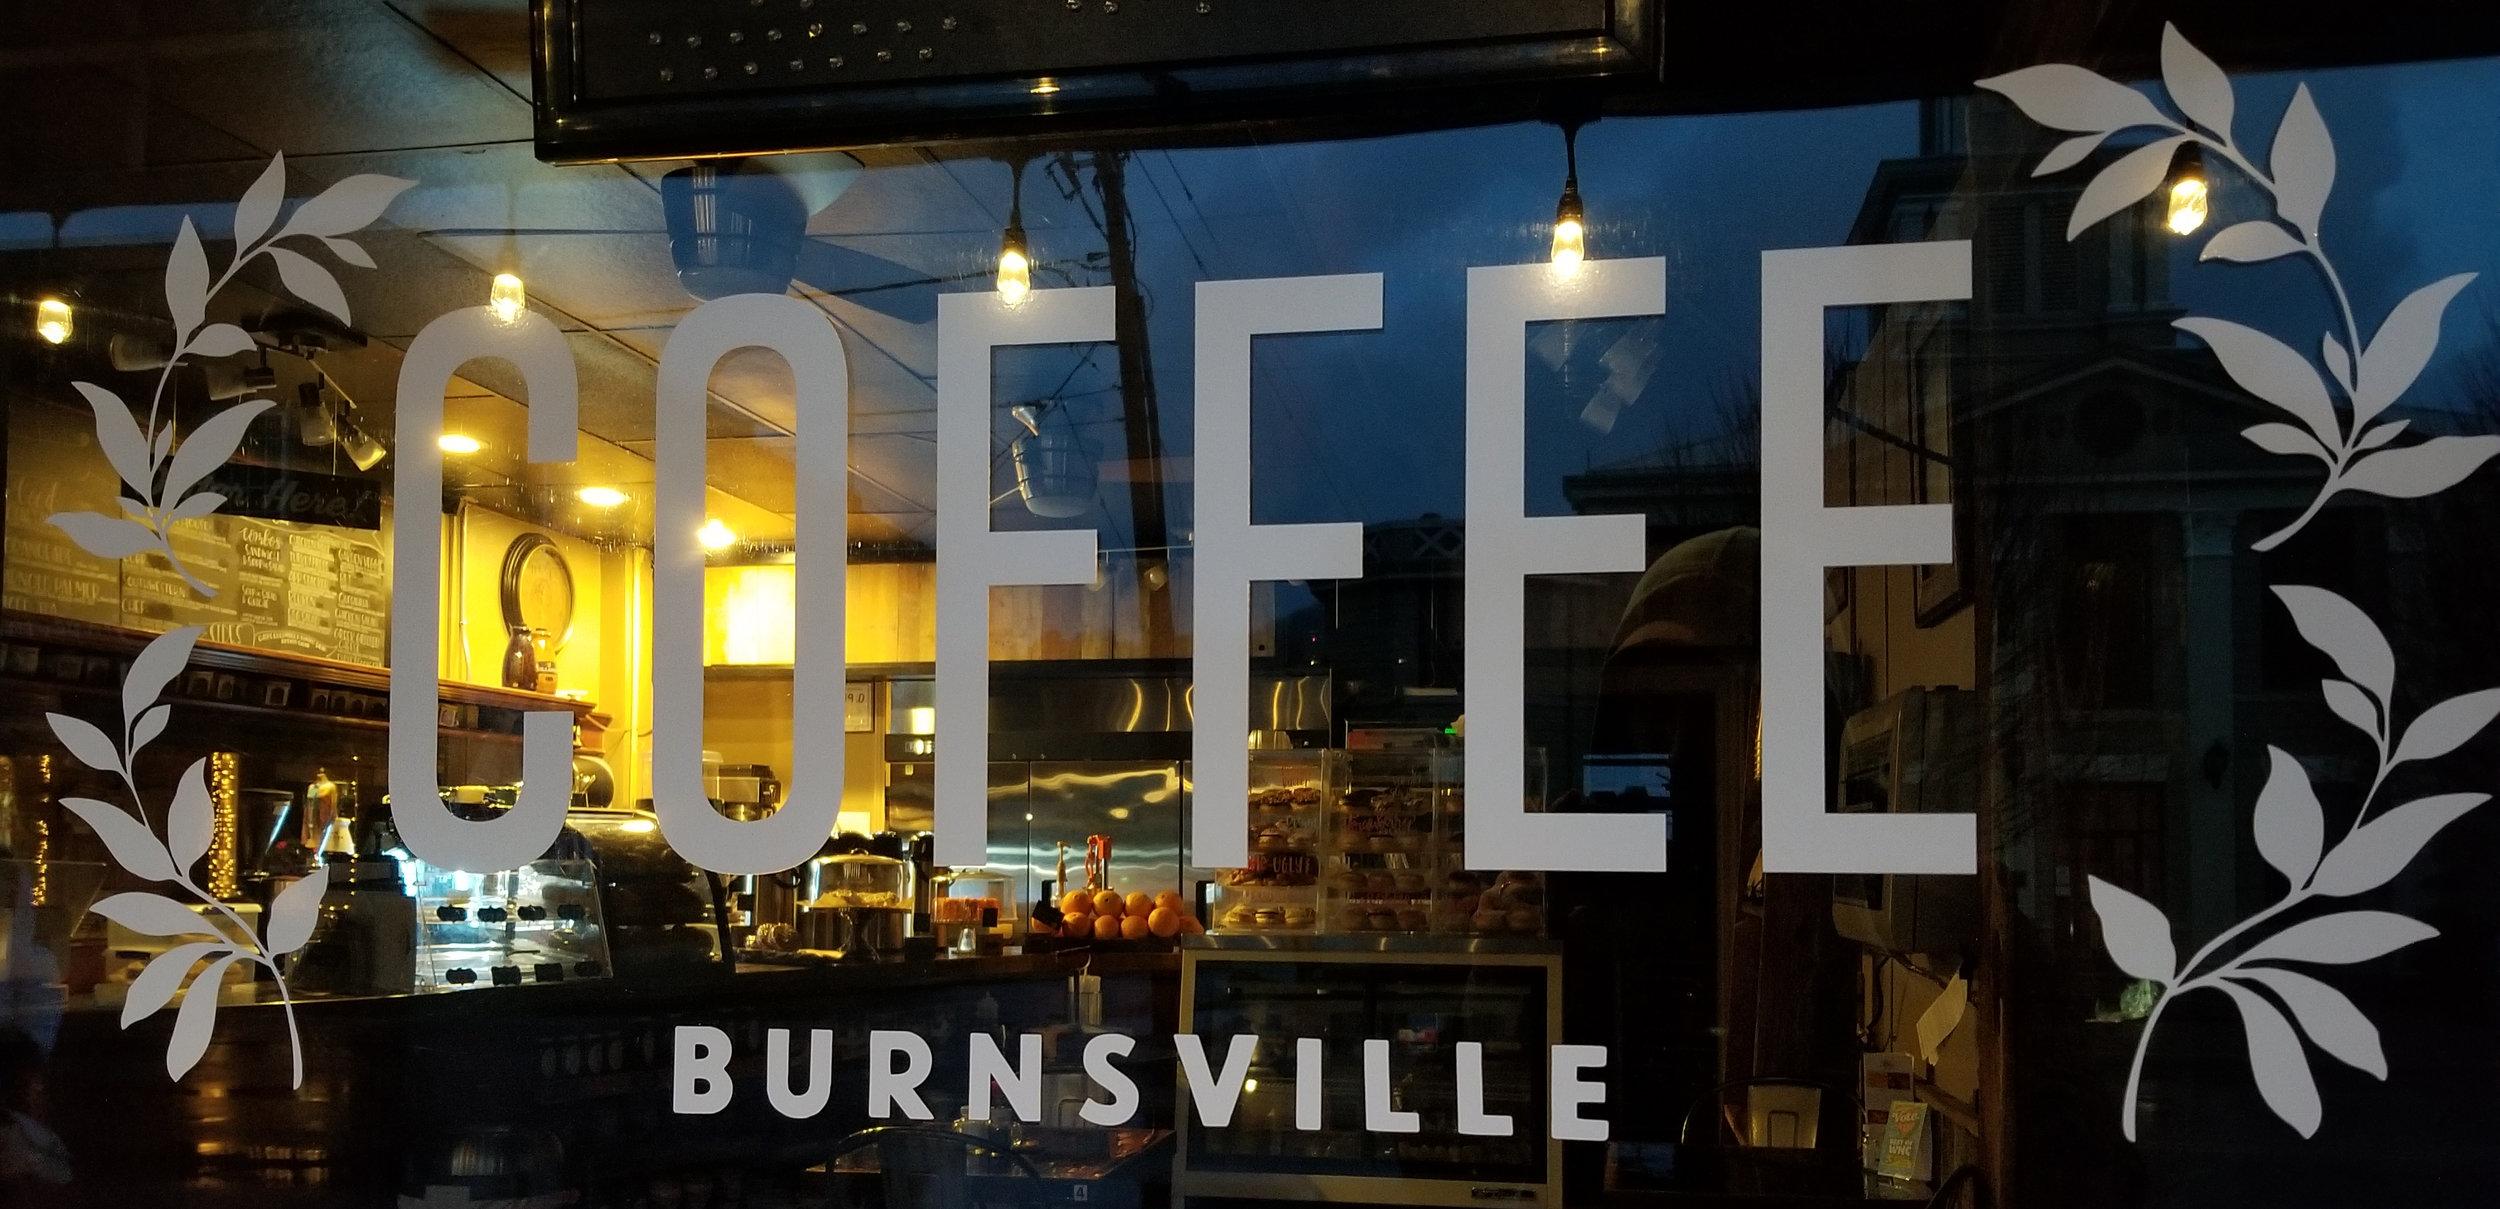 COFFEEburnsville.jpg